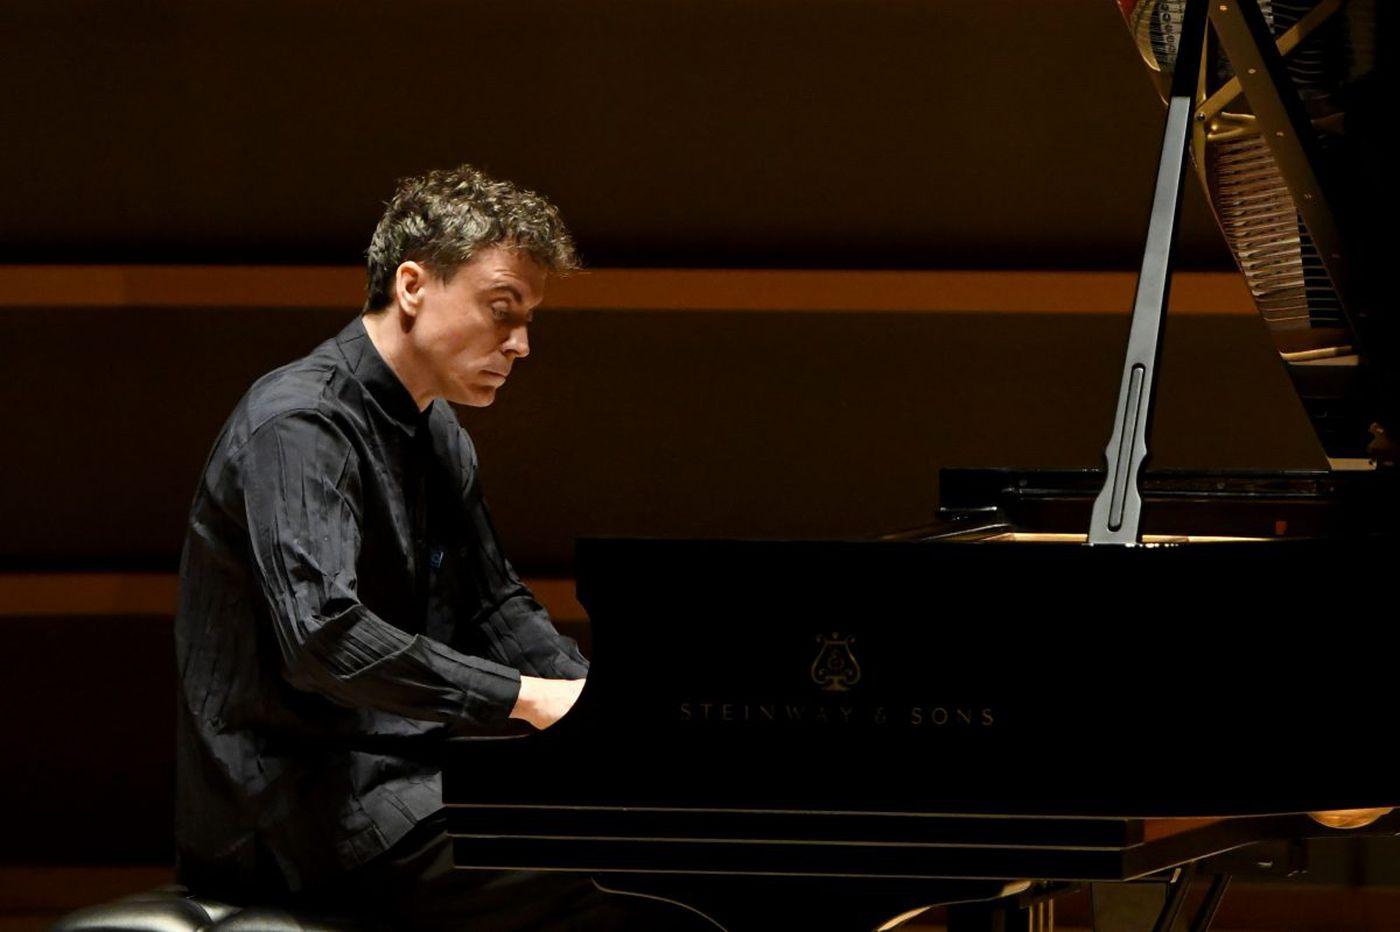 Paul Lewis closes Philadelphia Chamber Music Society piano series